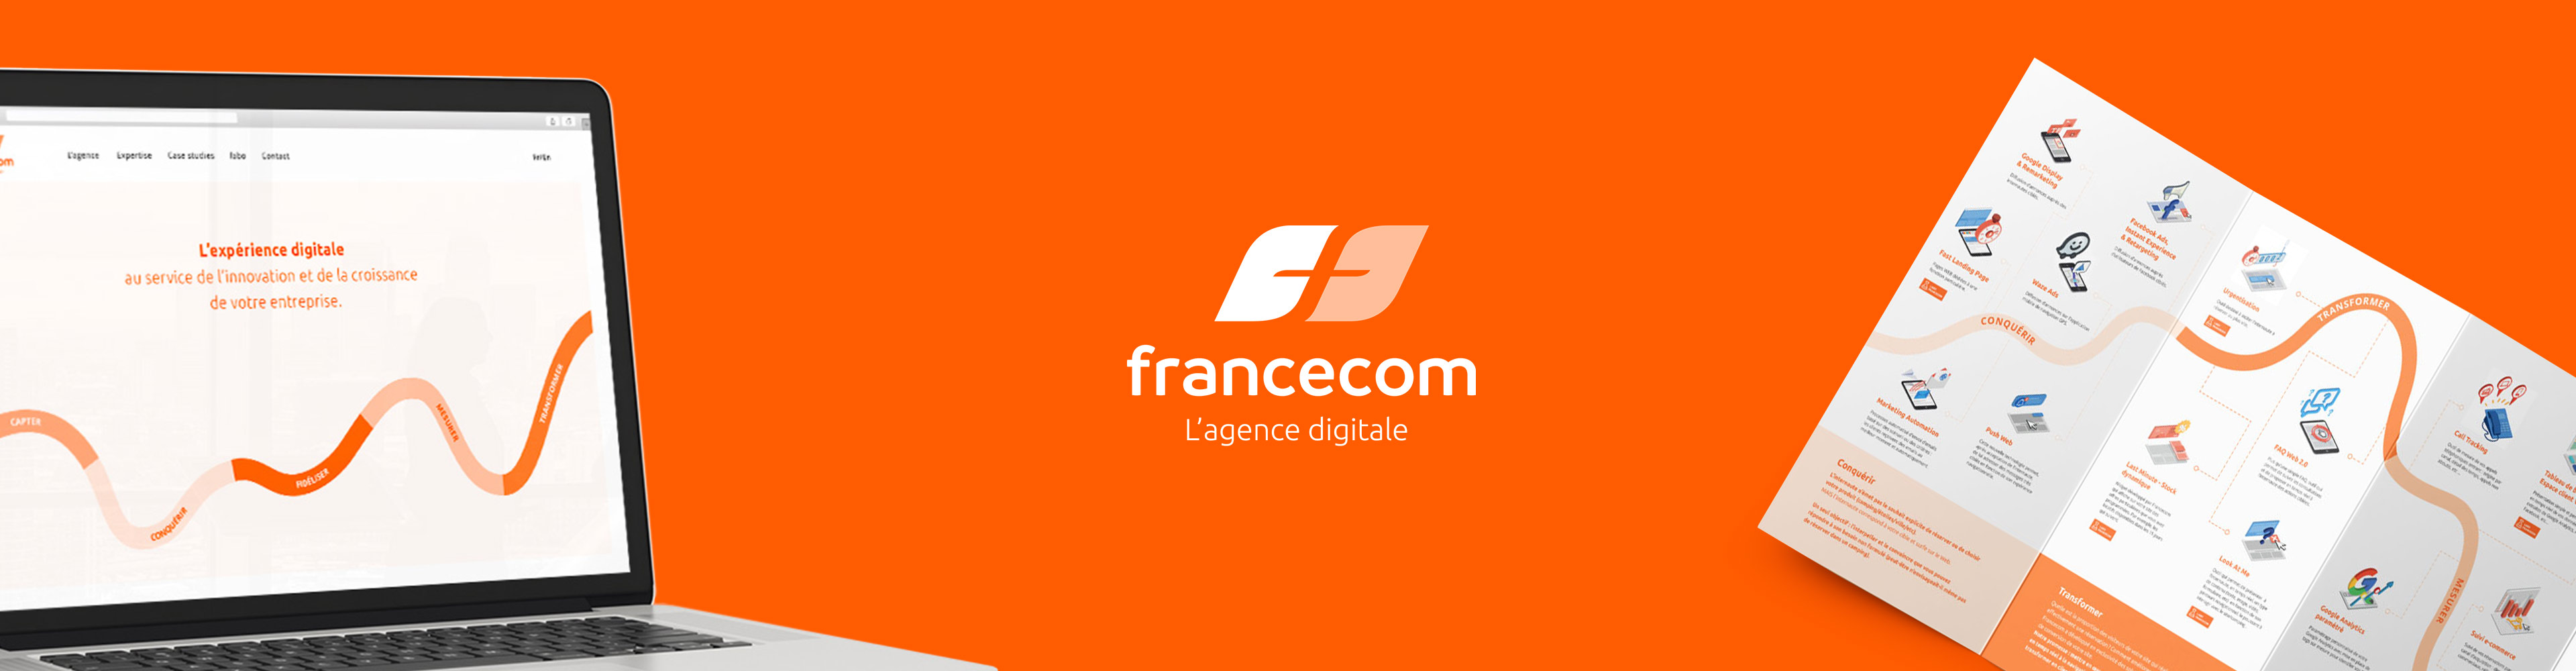 Francecom hero image